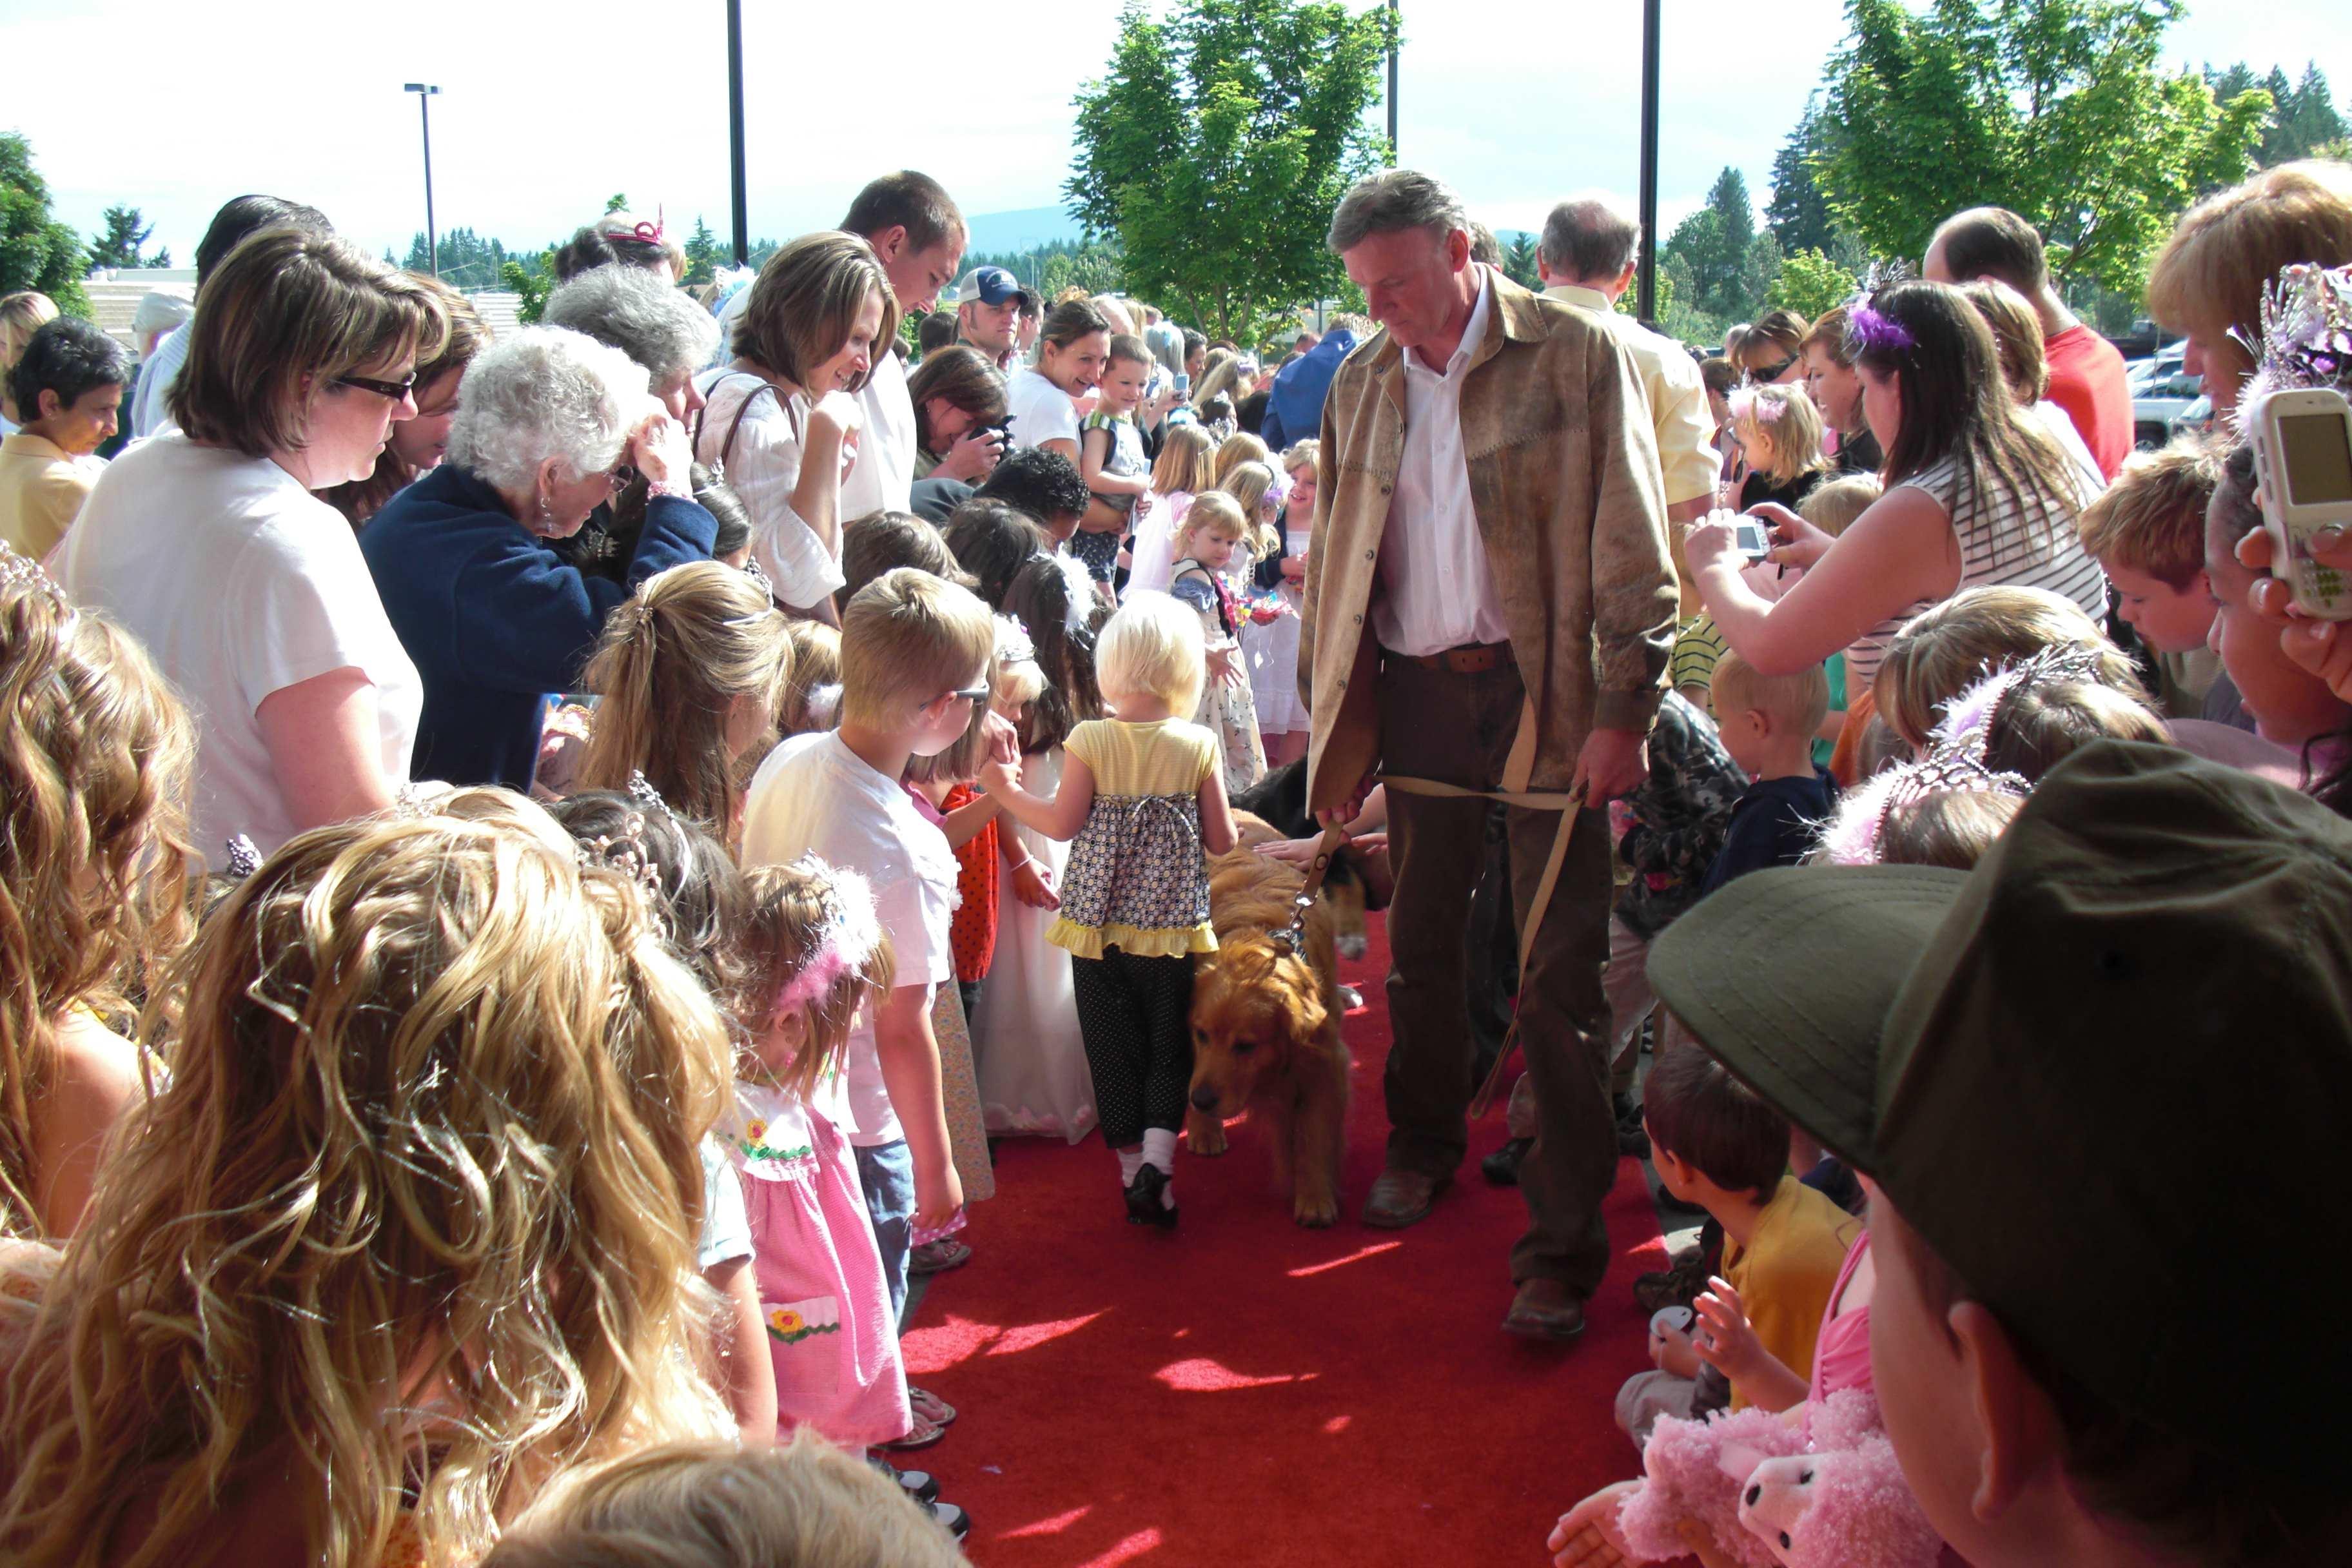 Champ arrives on the Red Carpet